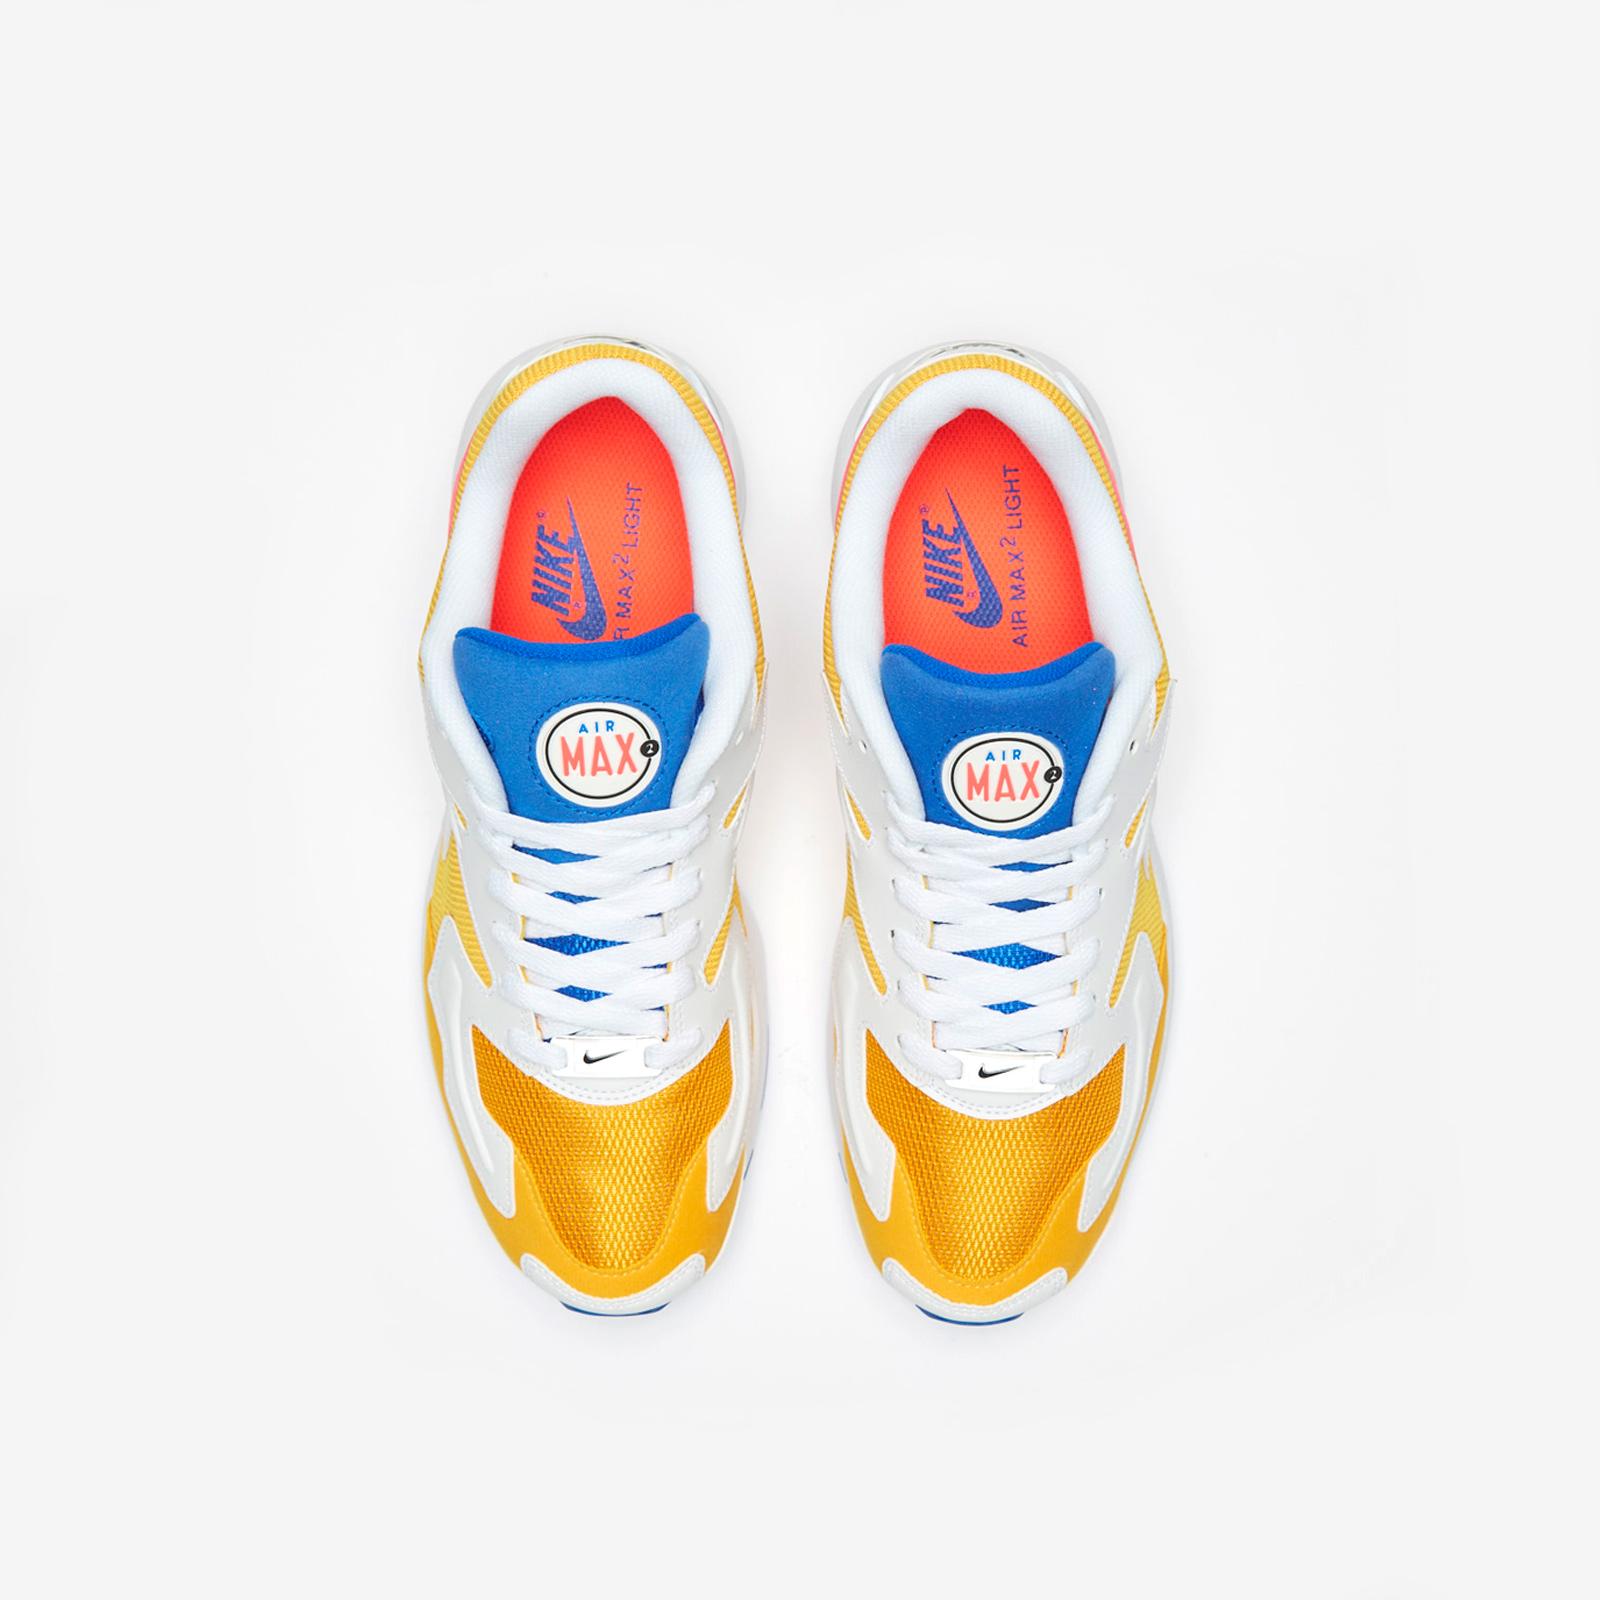 0f8299818c9 Nike Air Max2 Light - Ao1741-700 - Sneakersnstuff